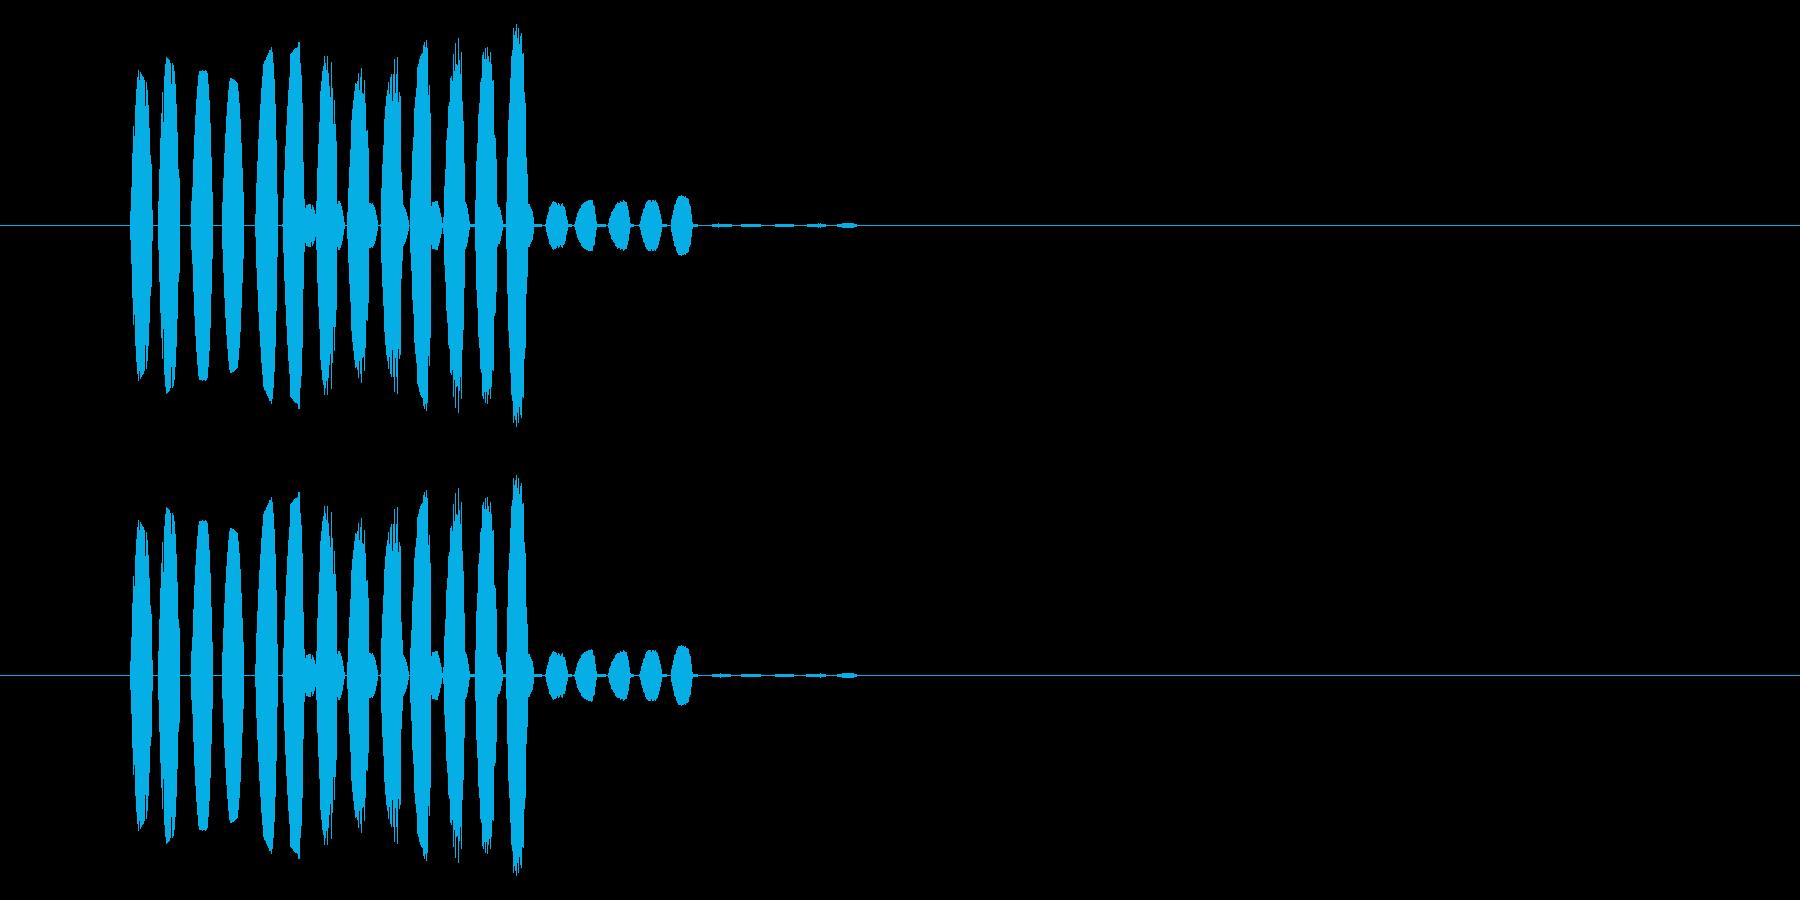 SNES-RPG04-15(魔法 状態)の再生済みの波形